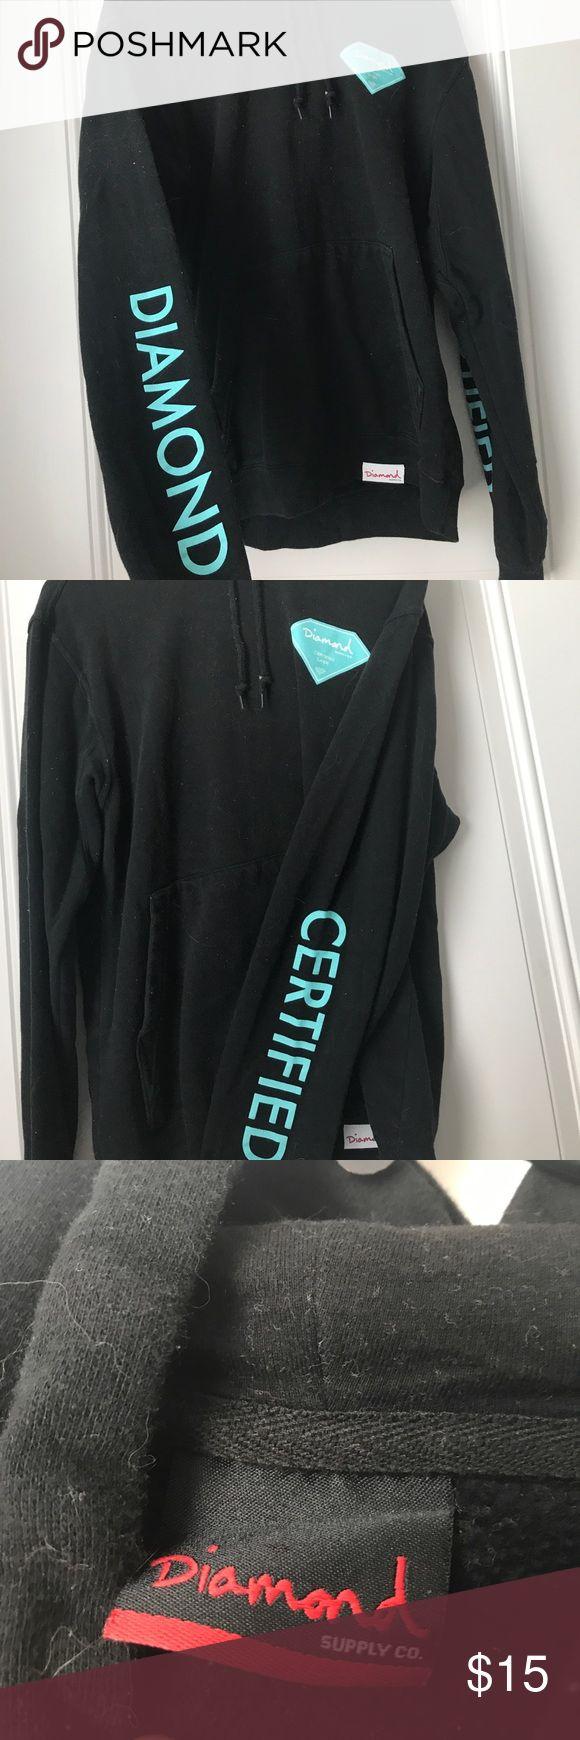 Diamond Supply Co Women's Hoodie Wore a couple times Diamond Supply Co. Tops Sweatshirts & Hoodies